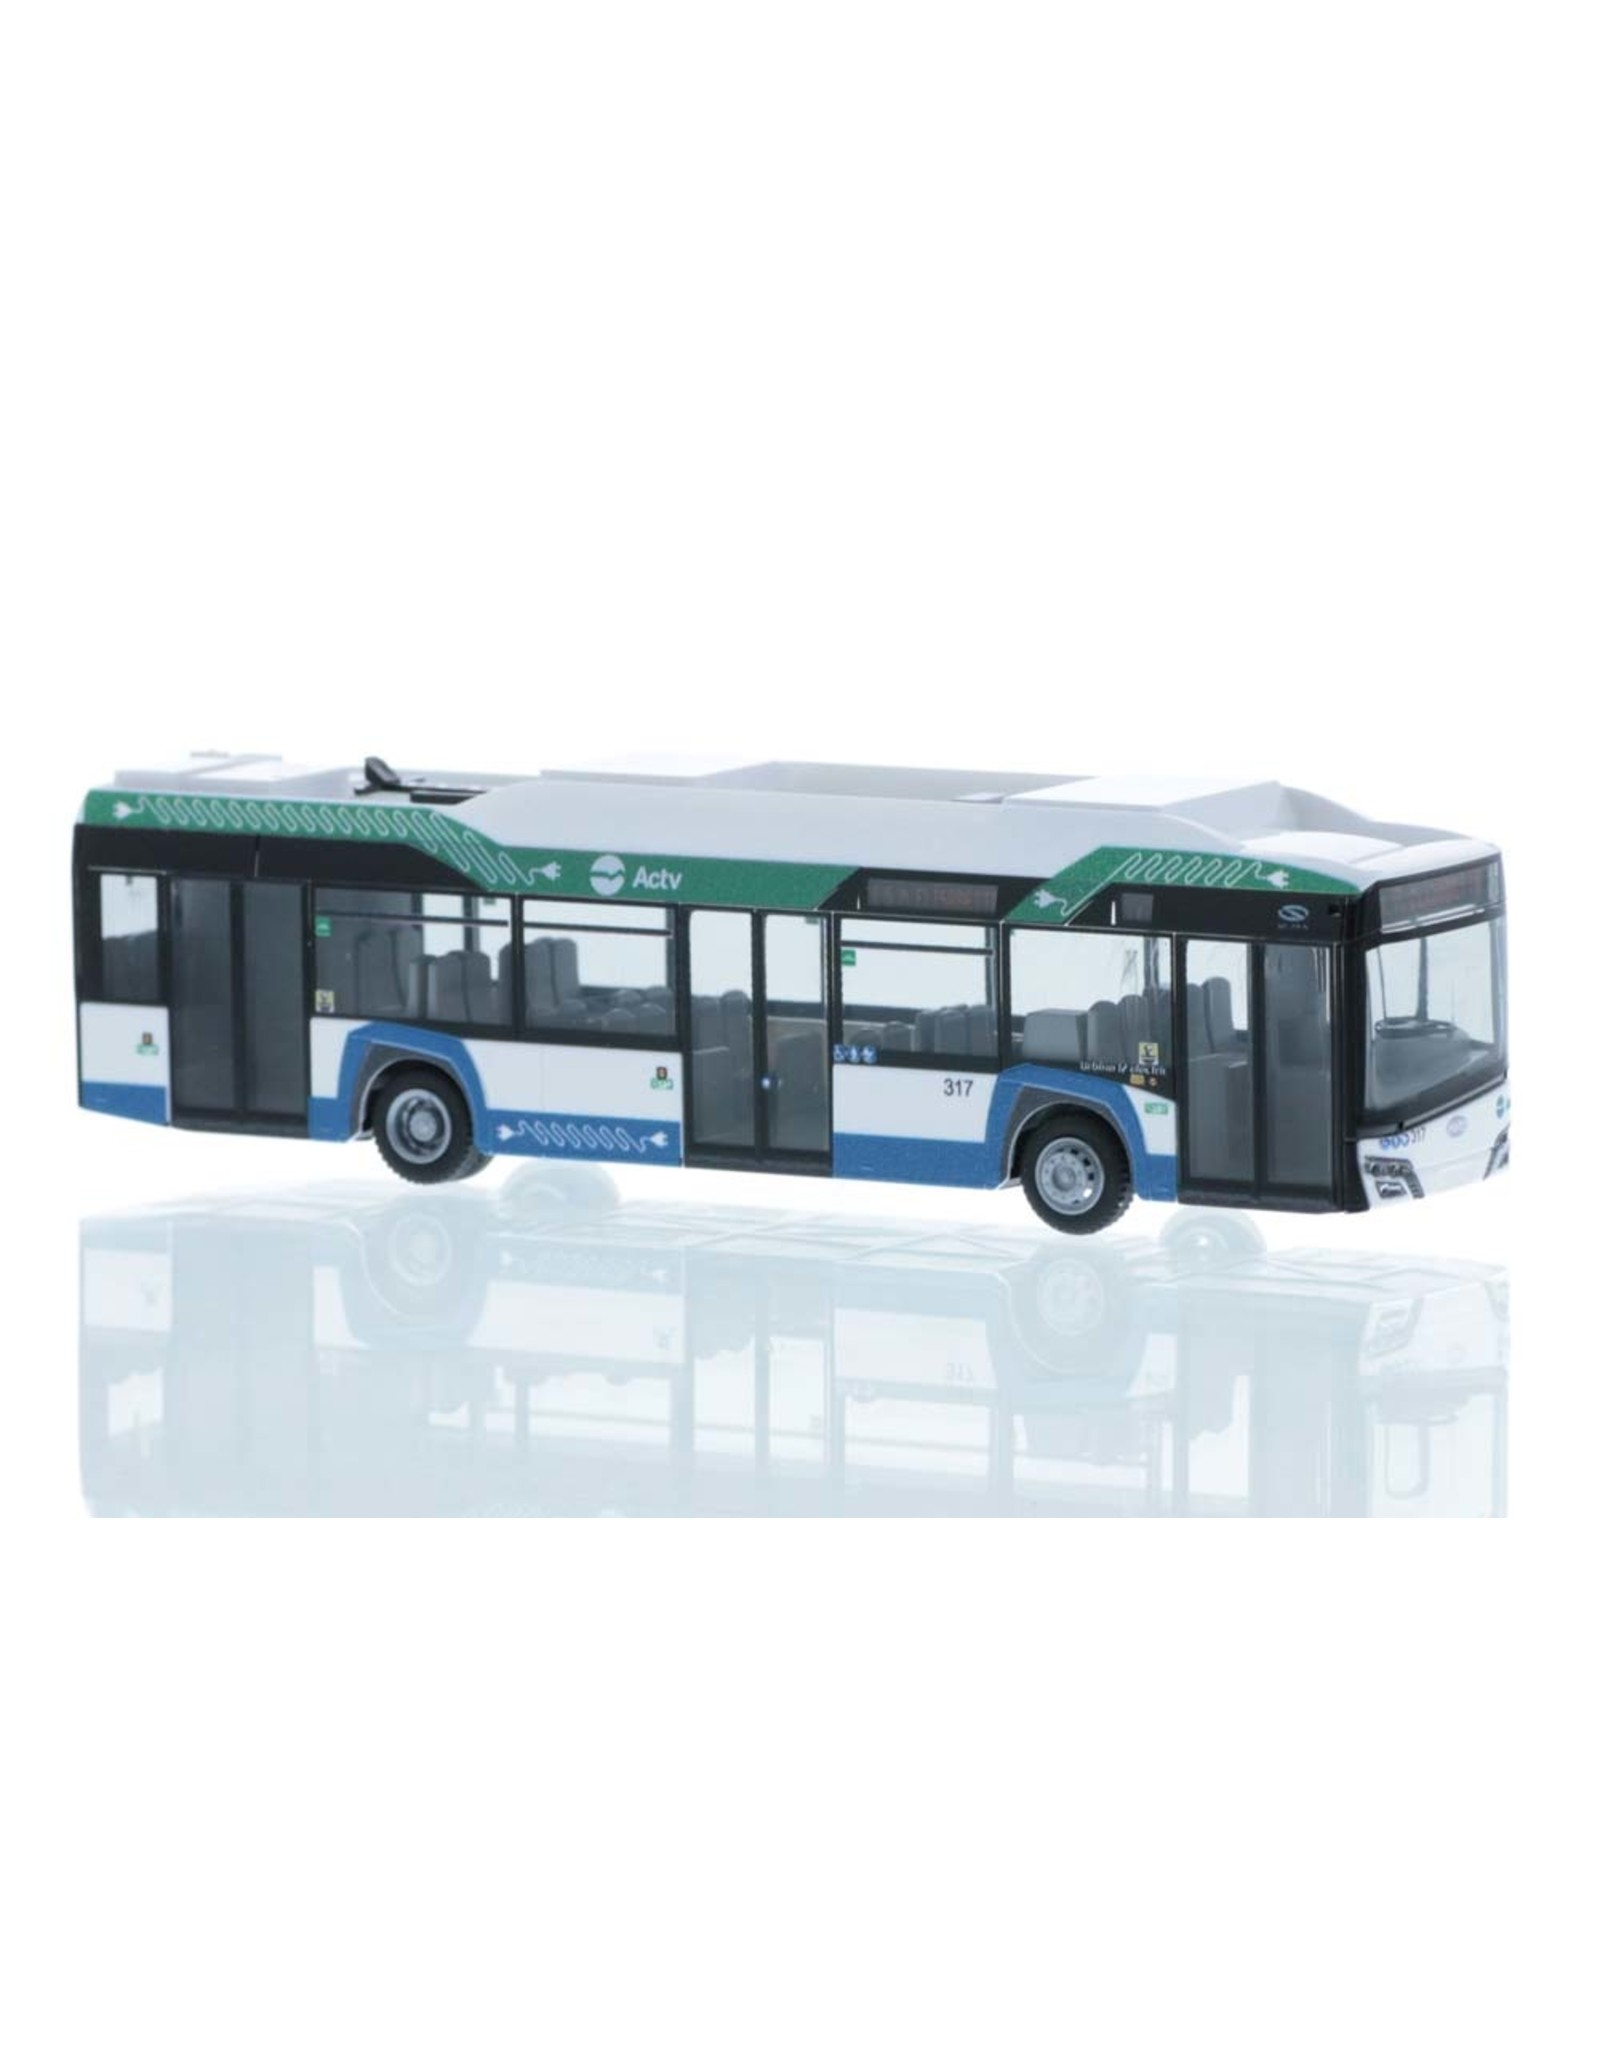 Solaris Solaris Urbino 12 Electric ACTV (Italy) 2019 - 1:87 - Rietze Automodelle